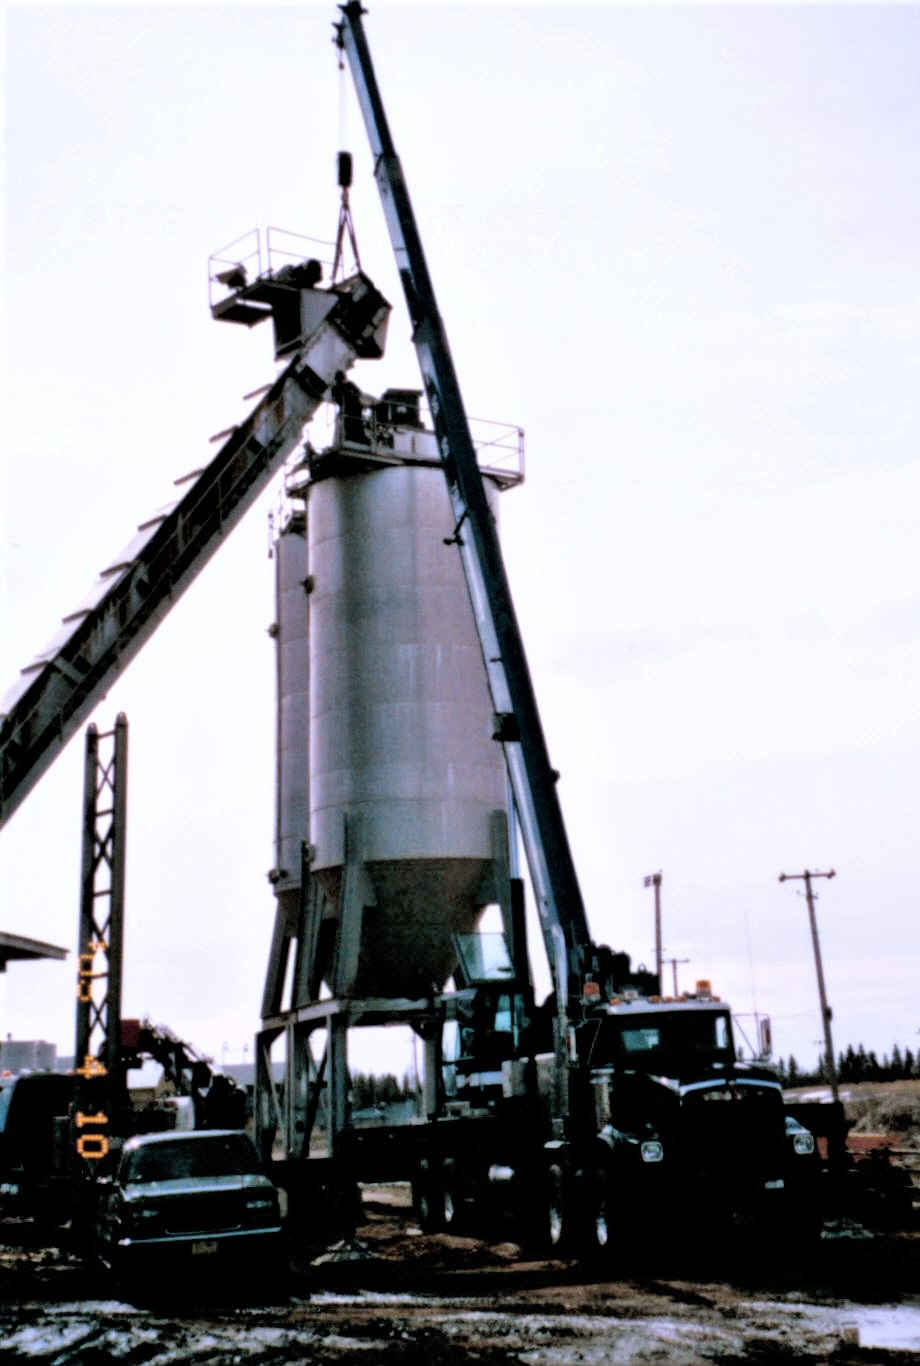 2004 assembling OF ASPHALT CONVEYOR with 42 ton